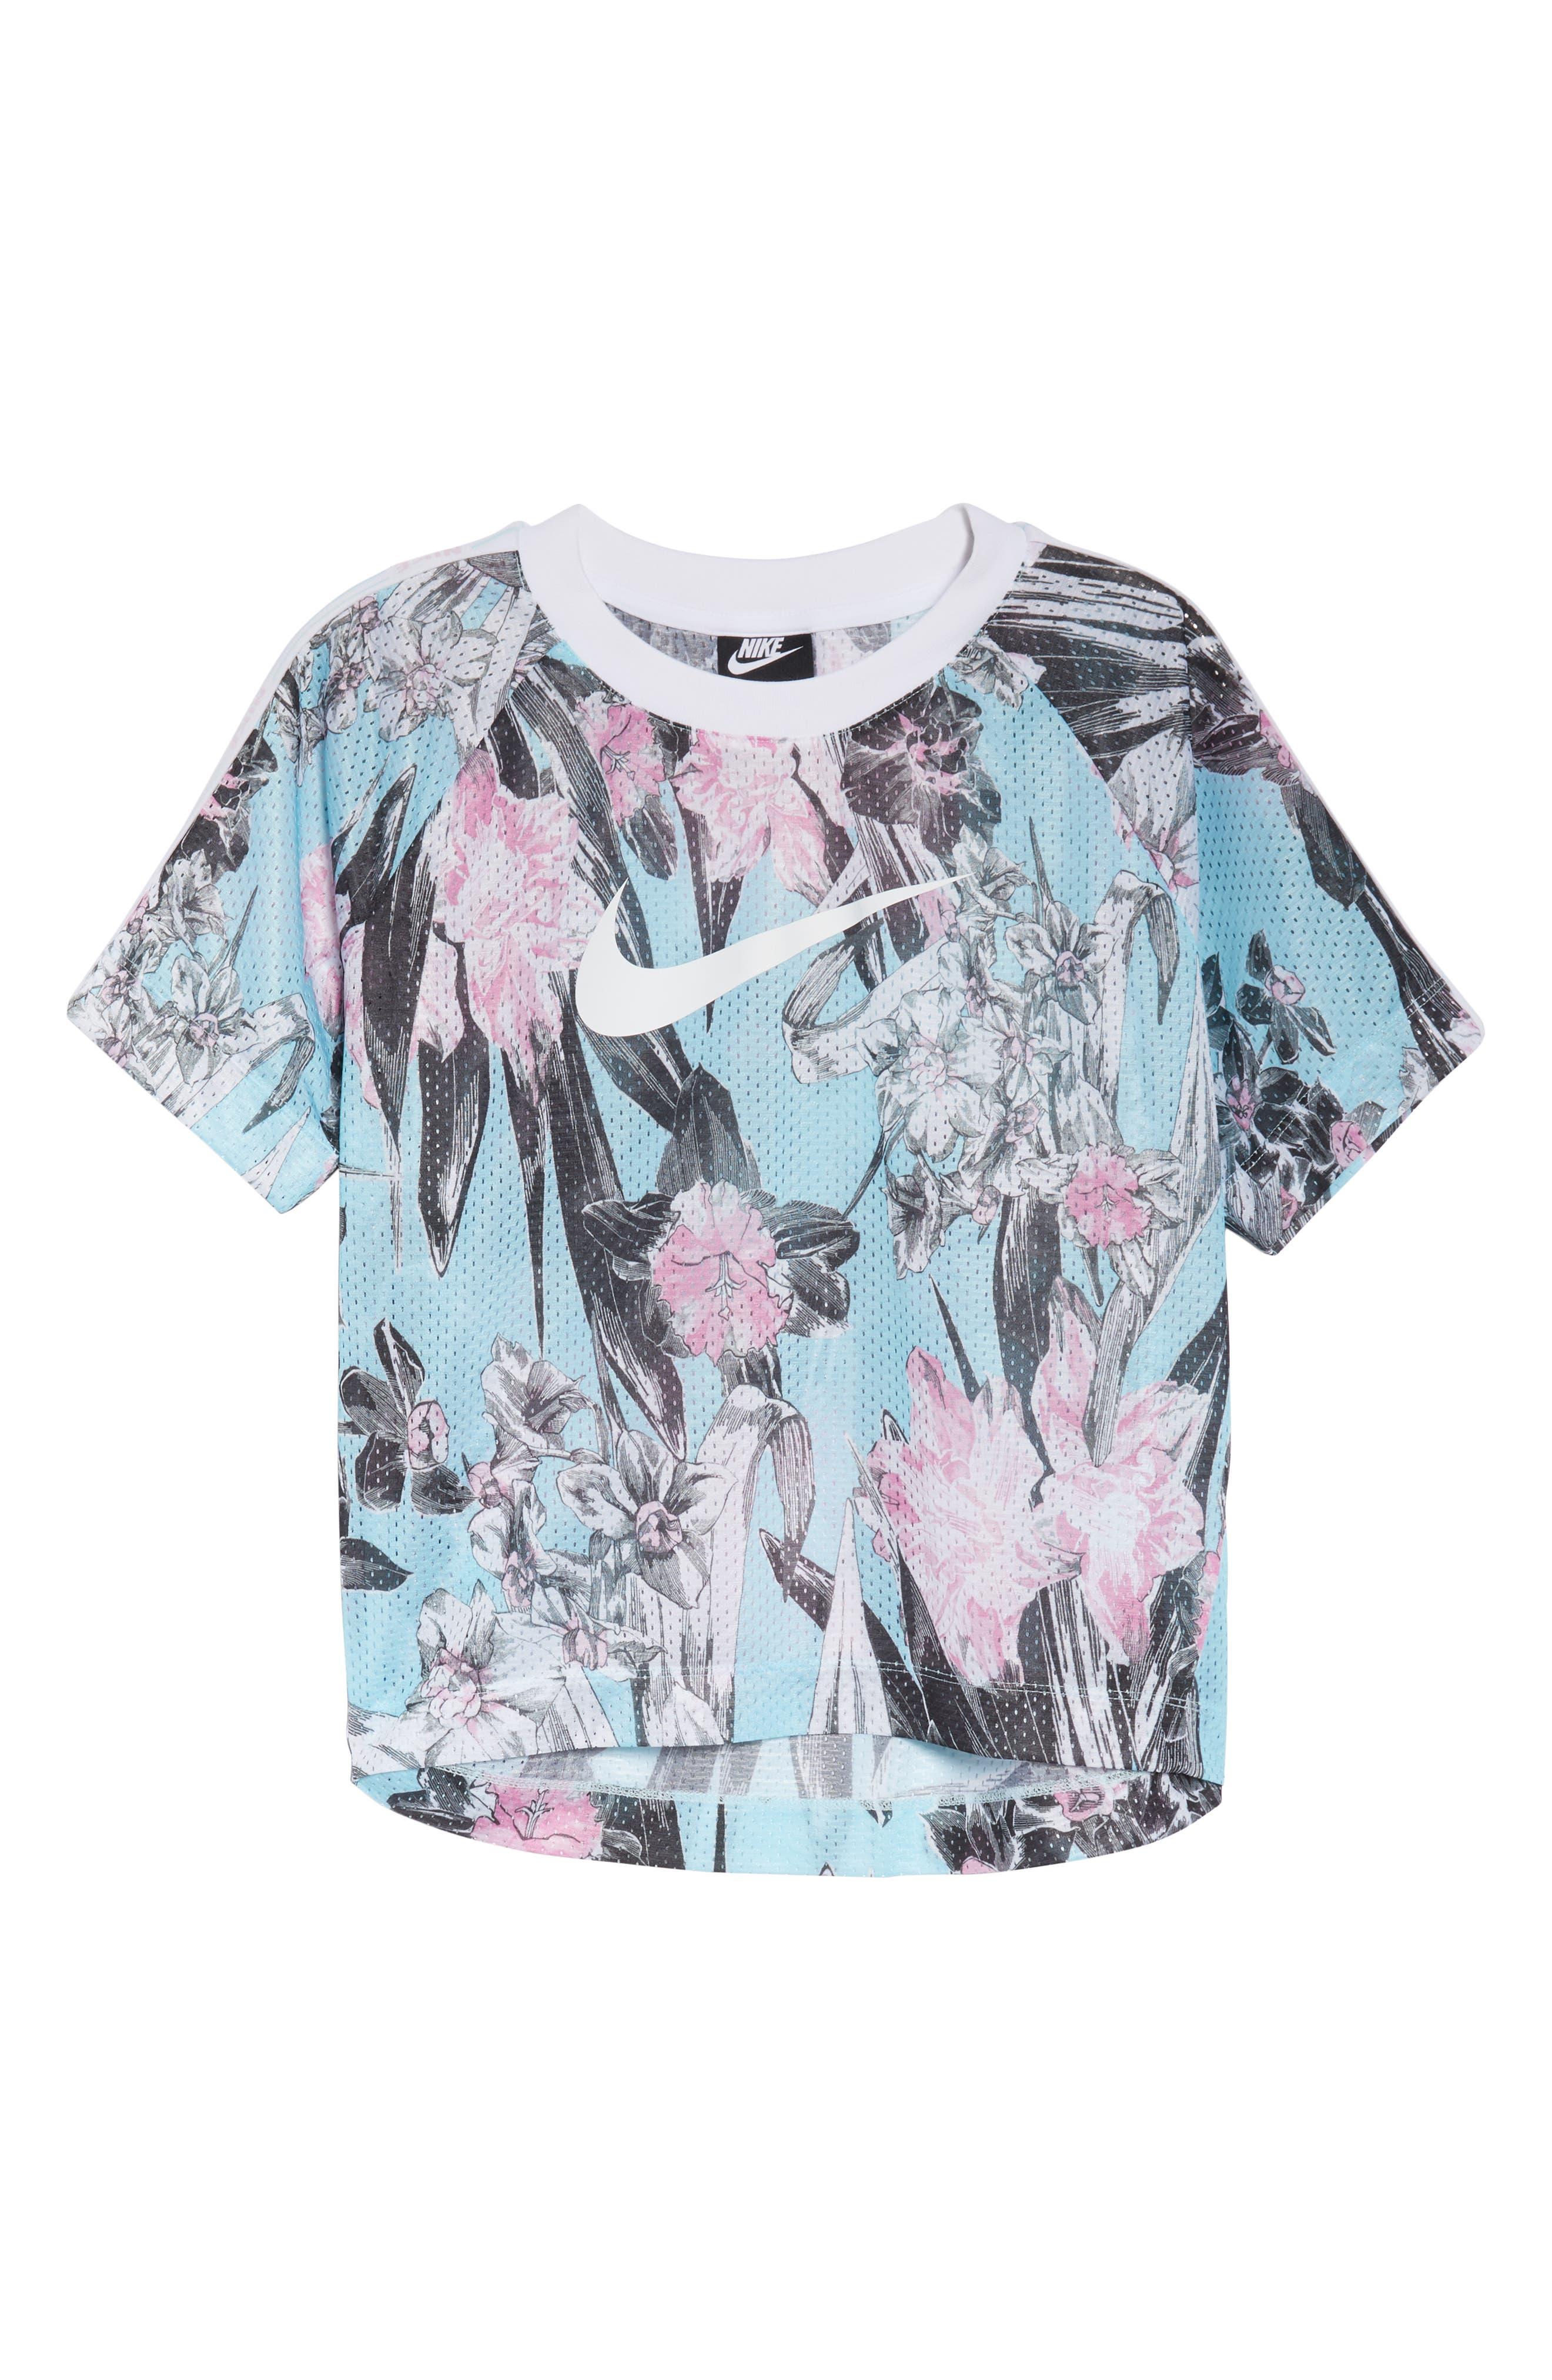 Sportswear Floral Print Mesh Top,                             Alternate thumbnail 7, color,                             TOPAZ MIST/ WHITE